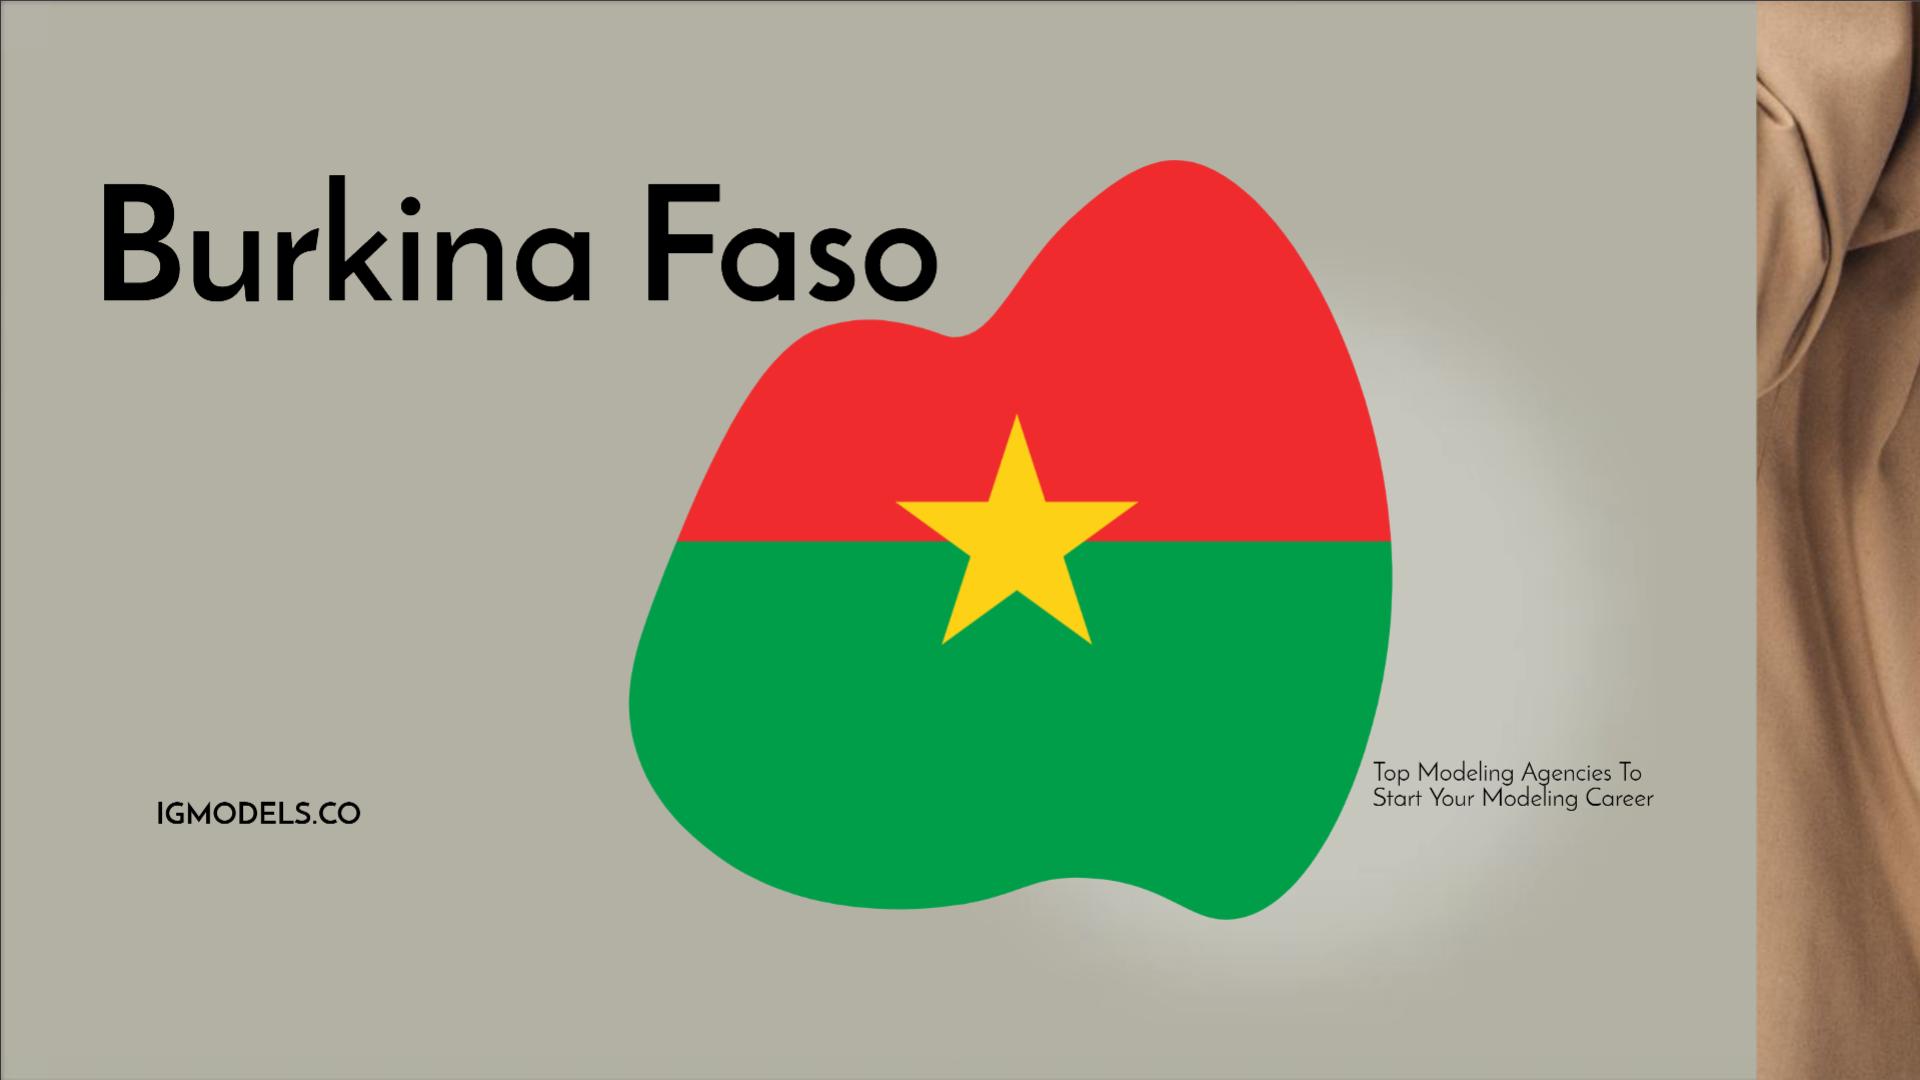 List : Top 35 Modeling Agencies In Burkina Faso To Start Your Modeling Career In 2021